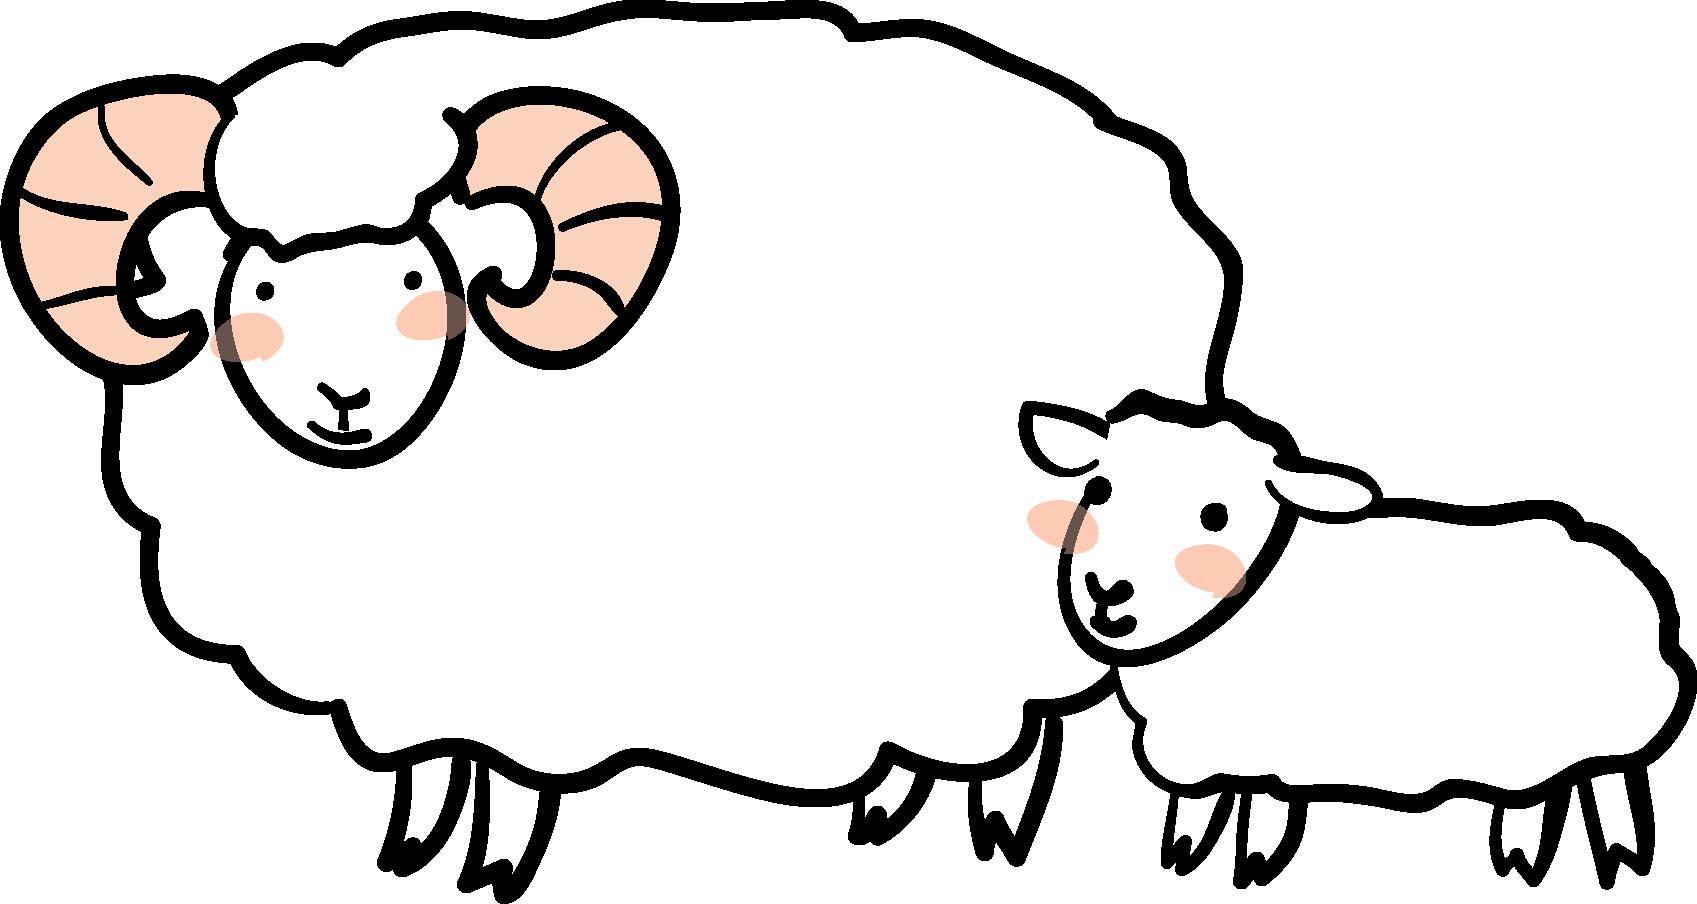 ... 羊の素材」羊の親子1 : 年賀状 写真 羊 : 年賀状